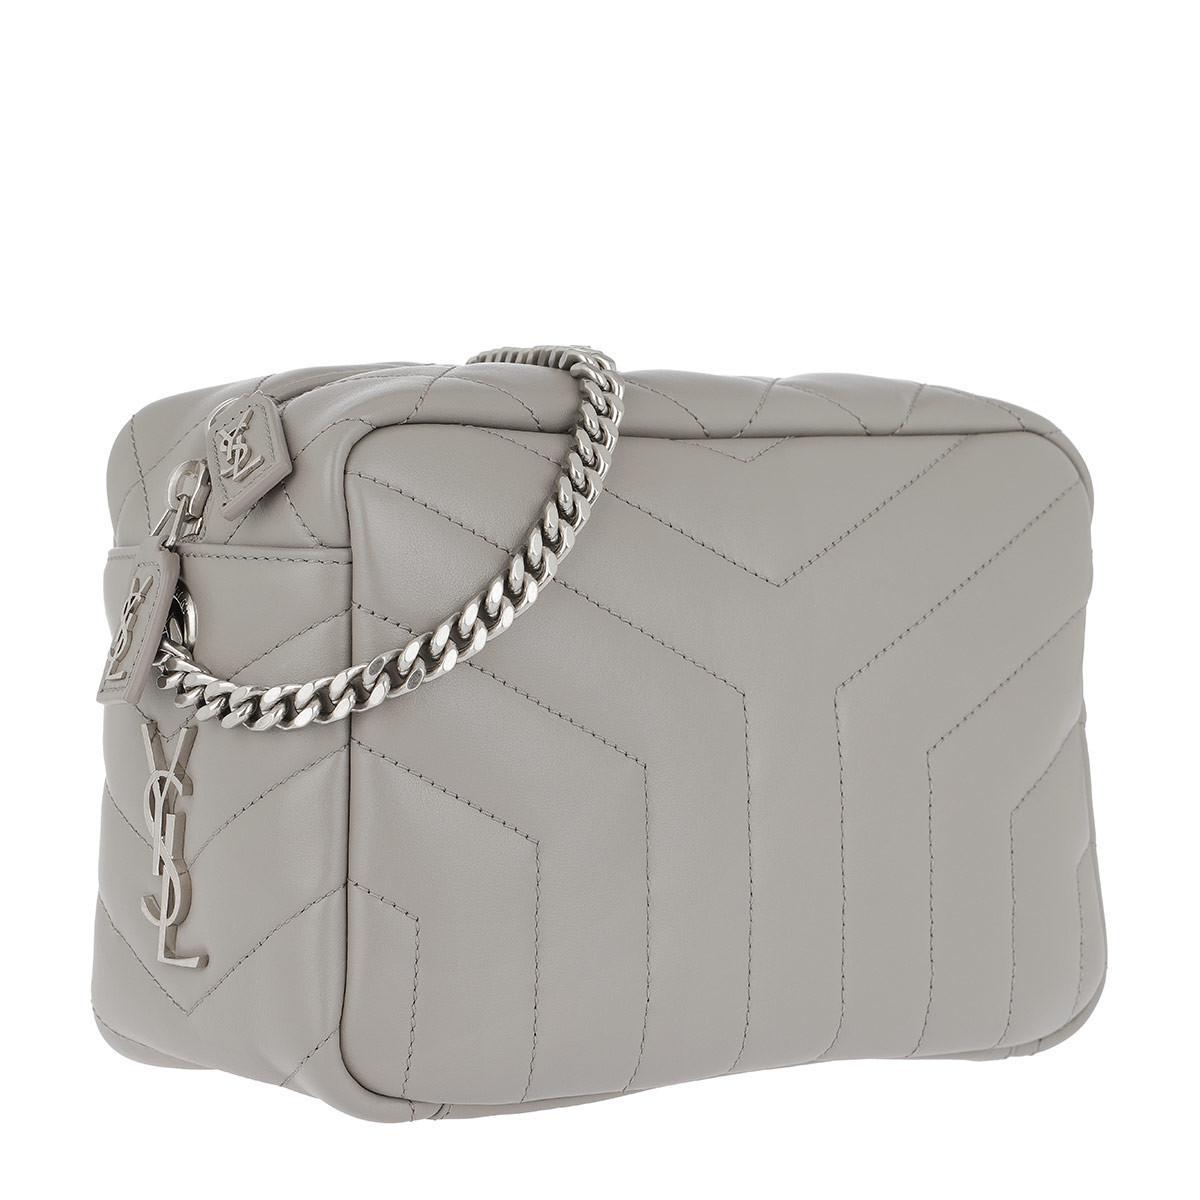 Ysl Camera Bag Black And Silver